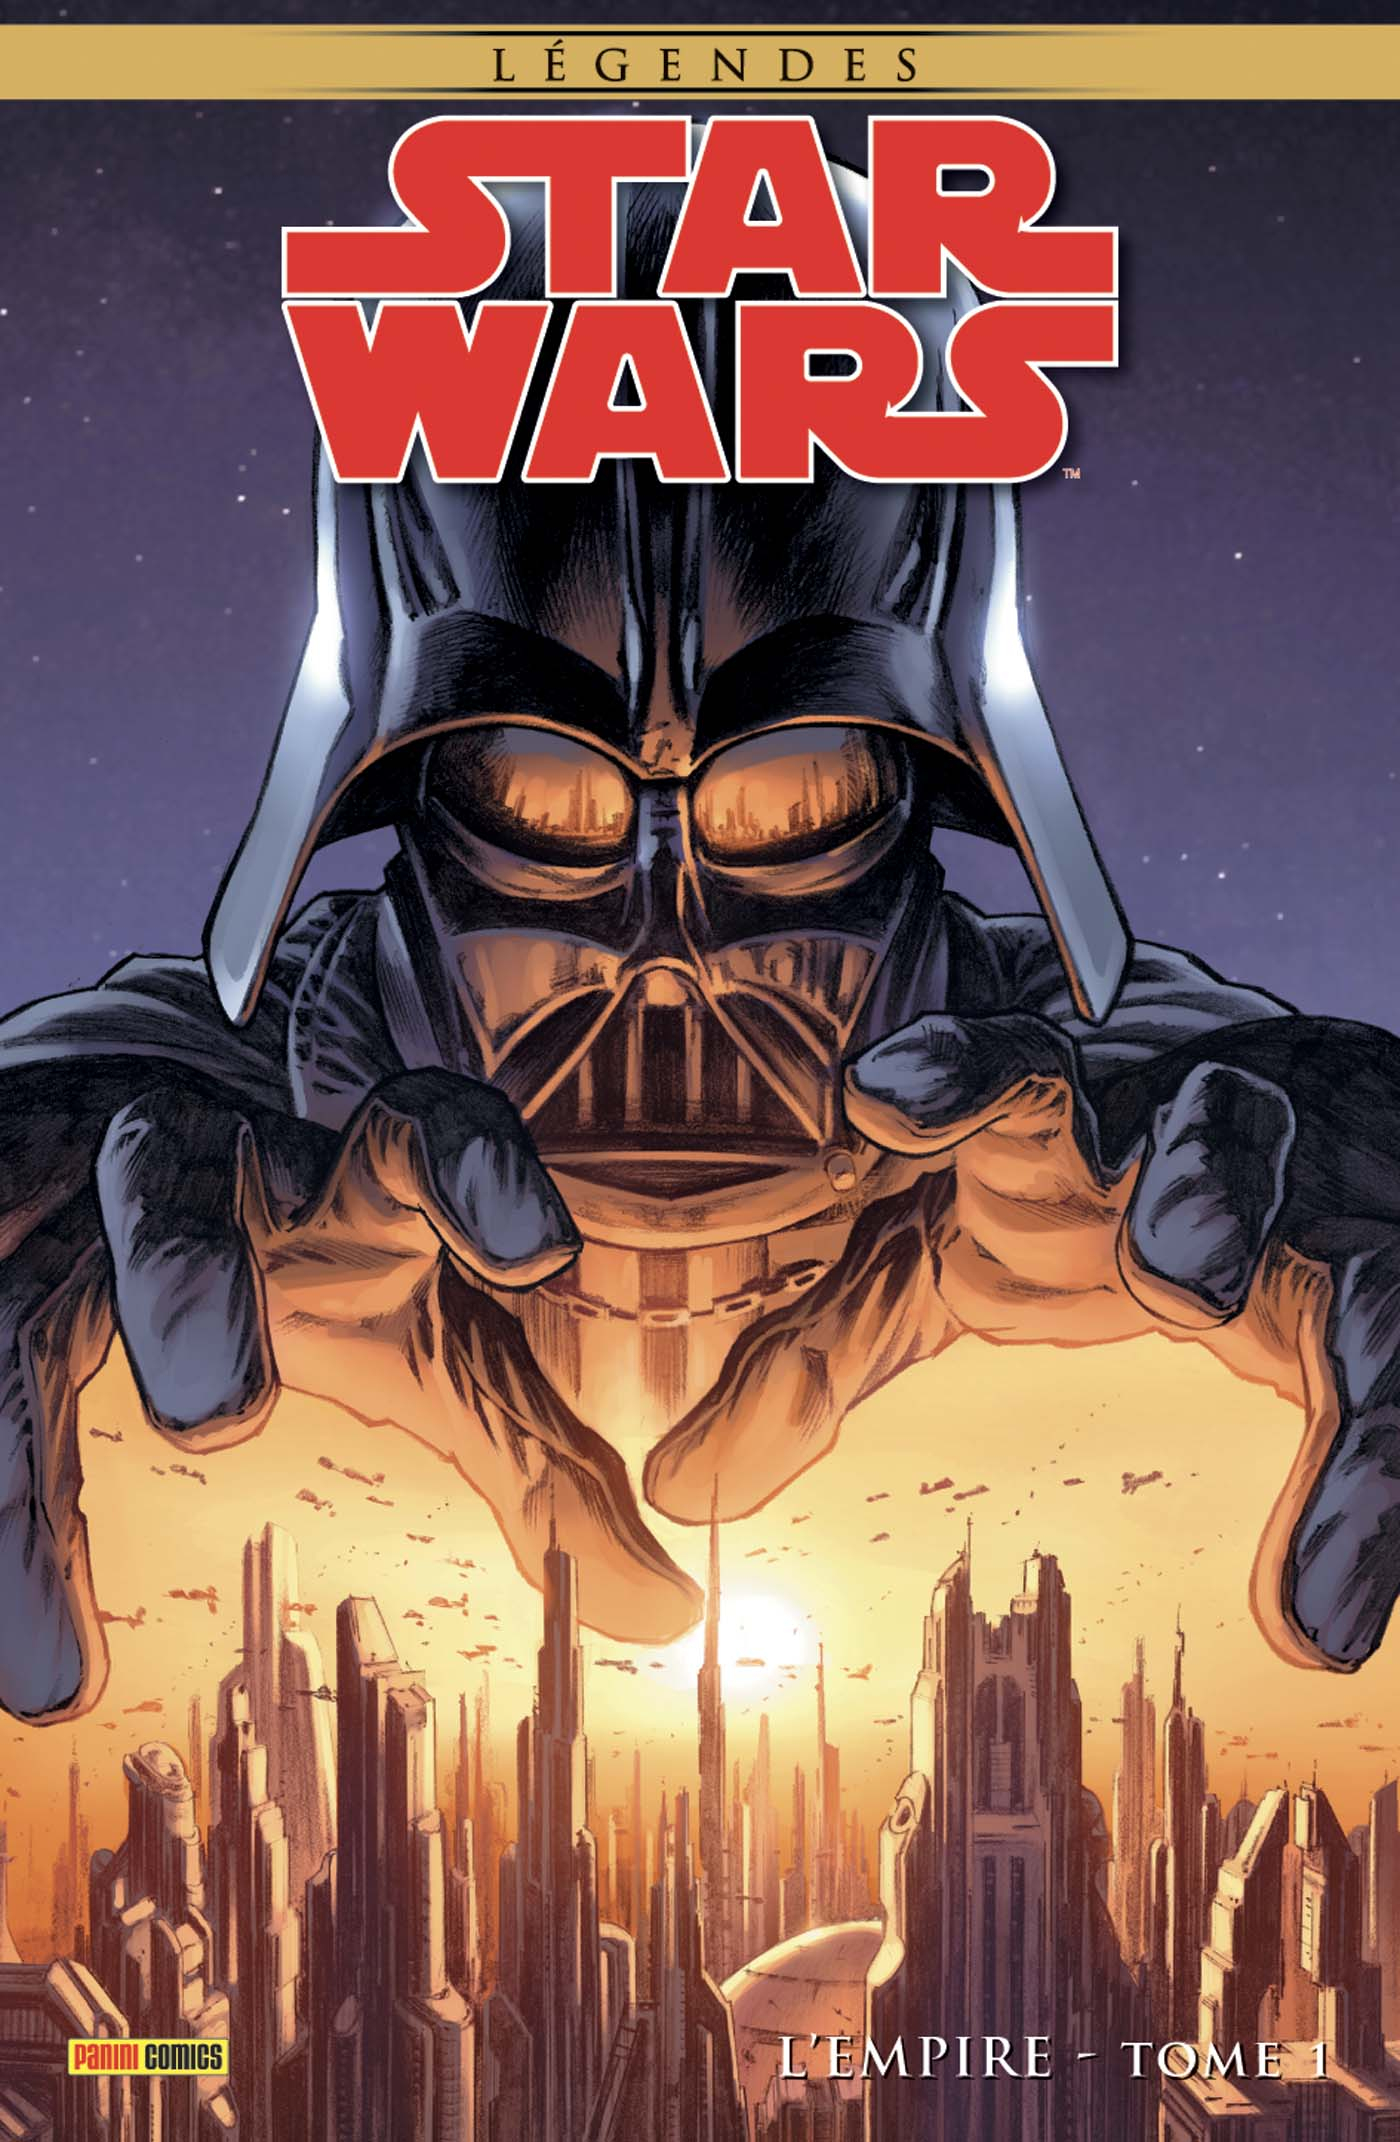 Star Wars Legendes : Clone Wars 1 - La Guerre des Clones - Epic Collection - 480 pages - Edition Collector (VF)